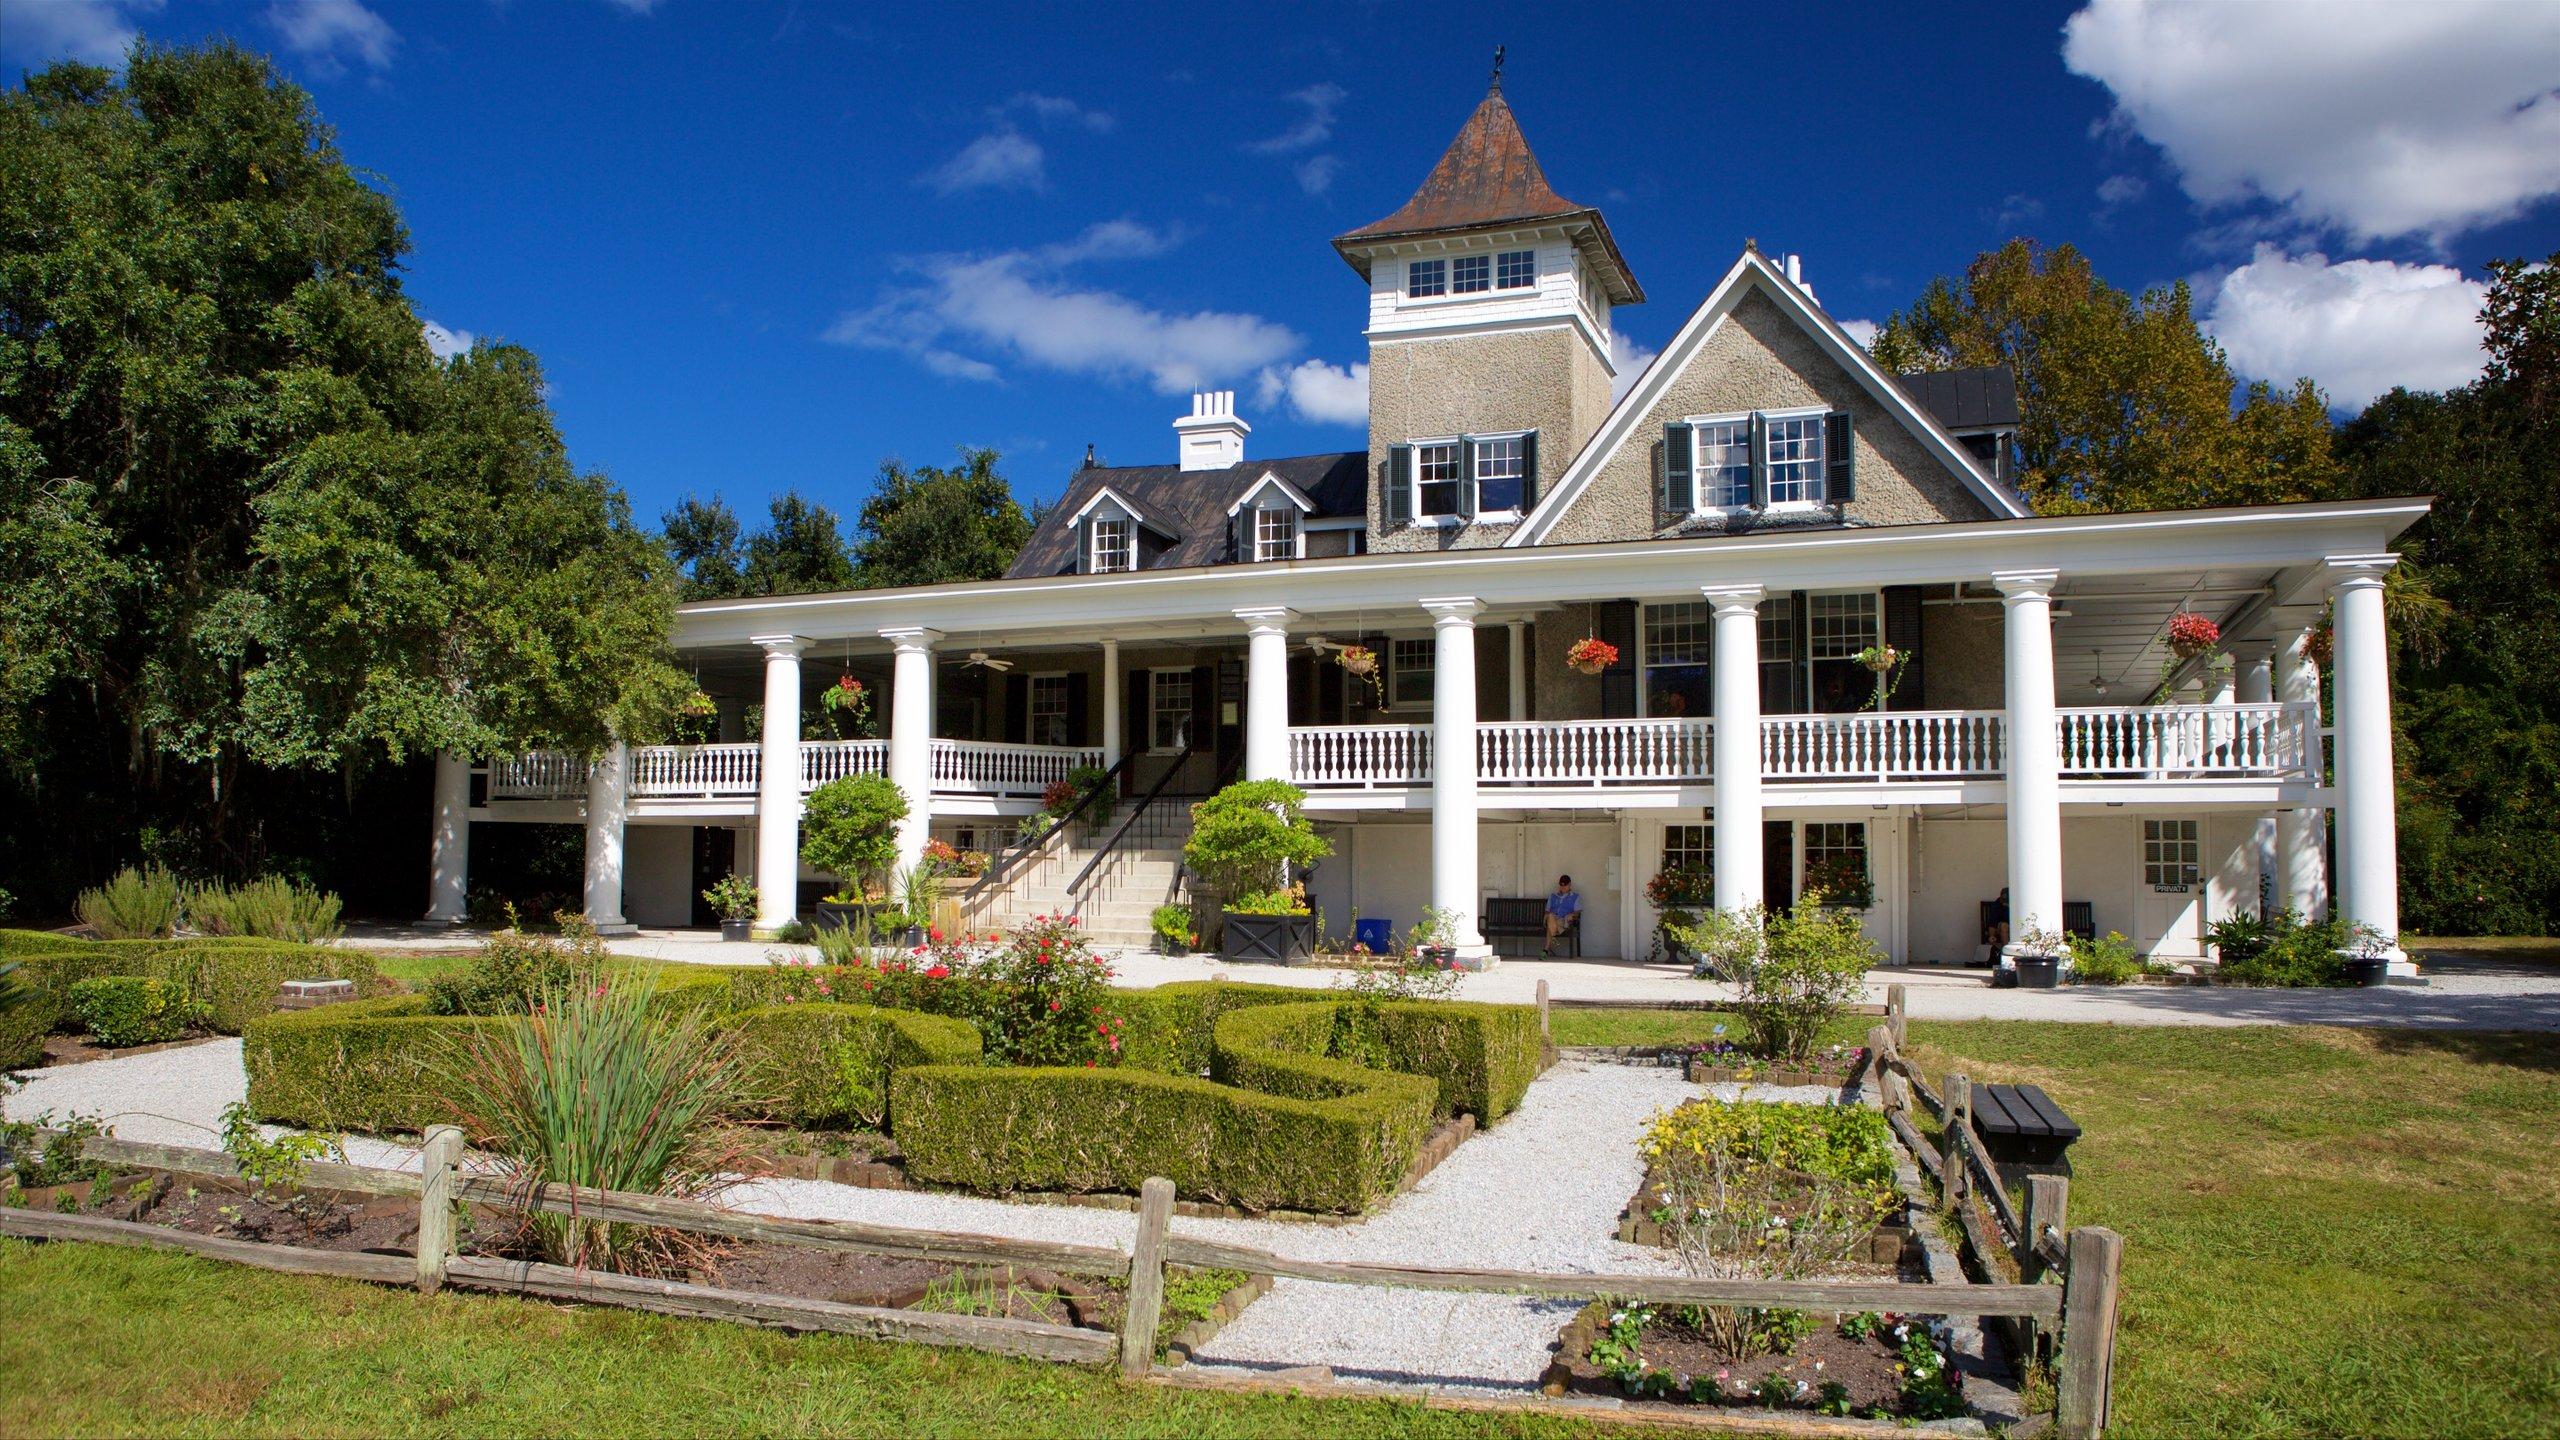 Magnolia Plantation and Gardens, Charleston, South Carolina, United States of America